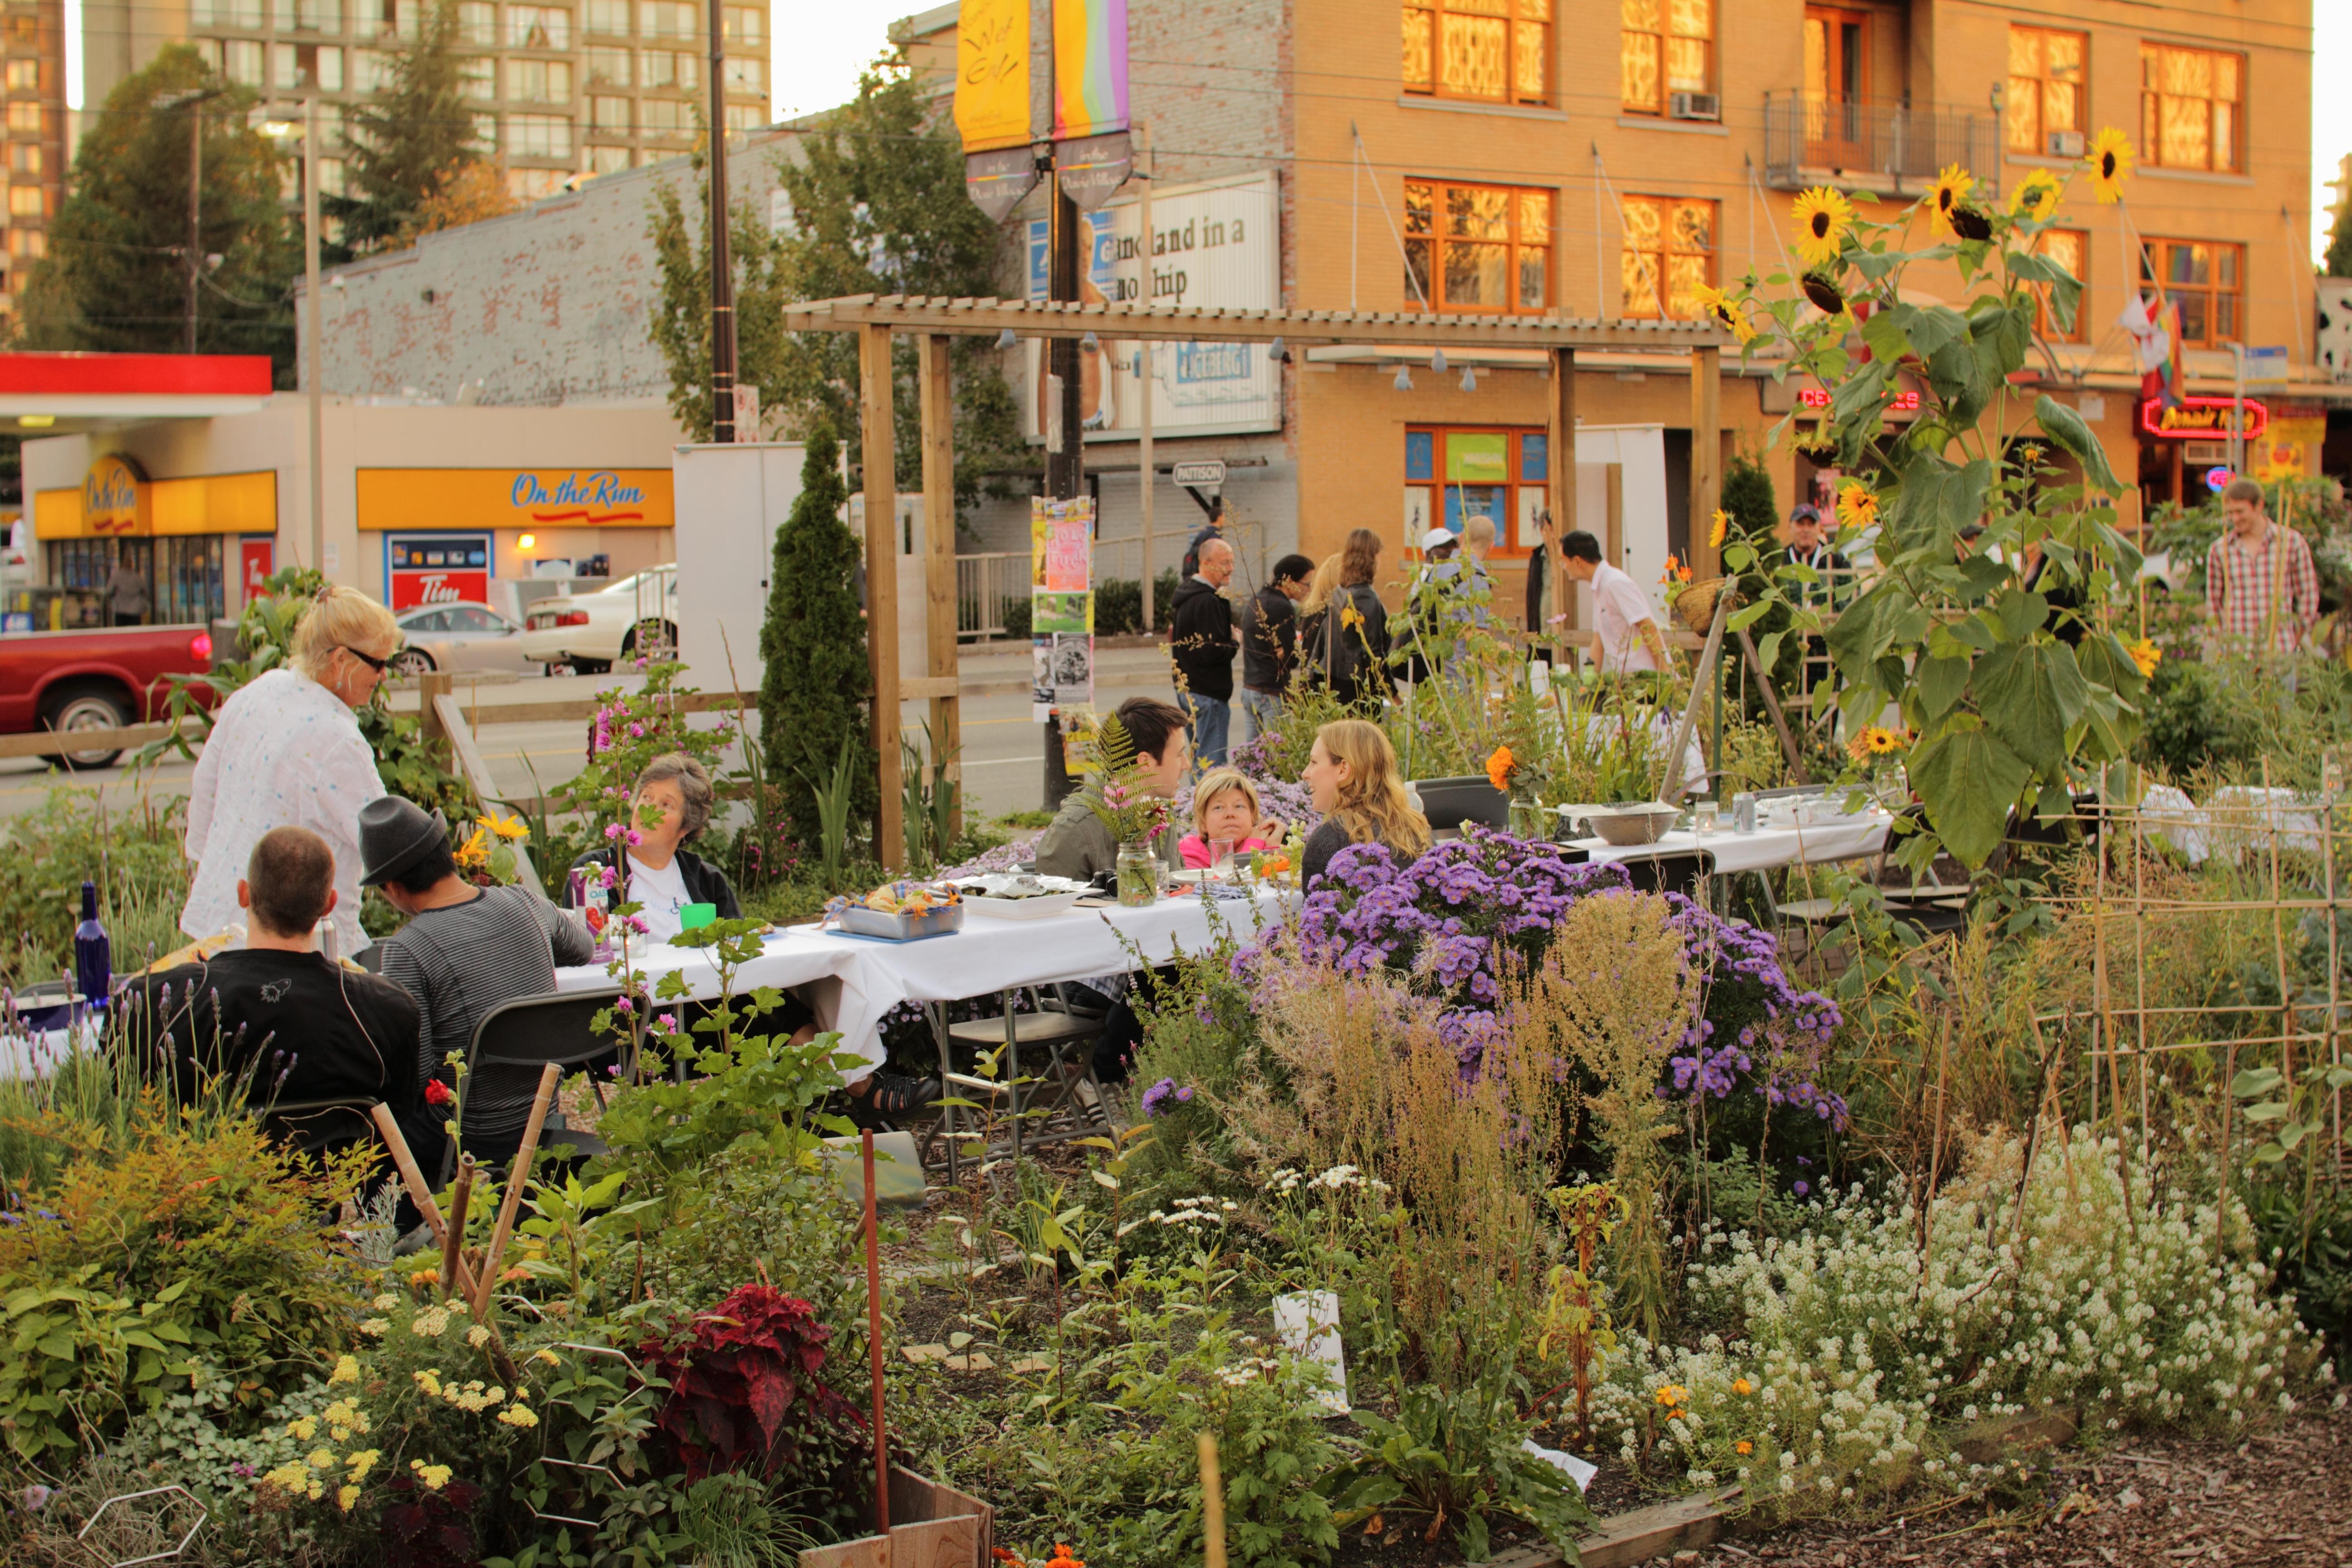 File:2010 Davie Street community garden Vancouver BC Canada ...